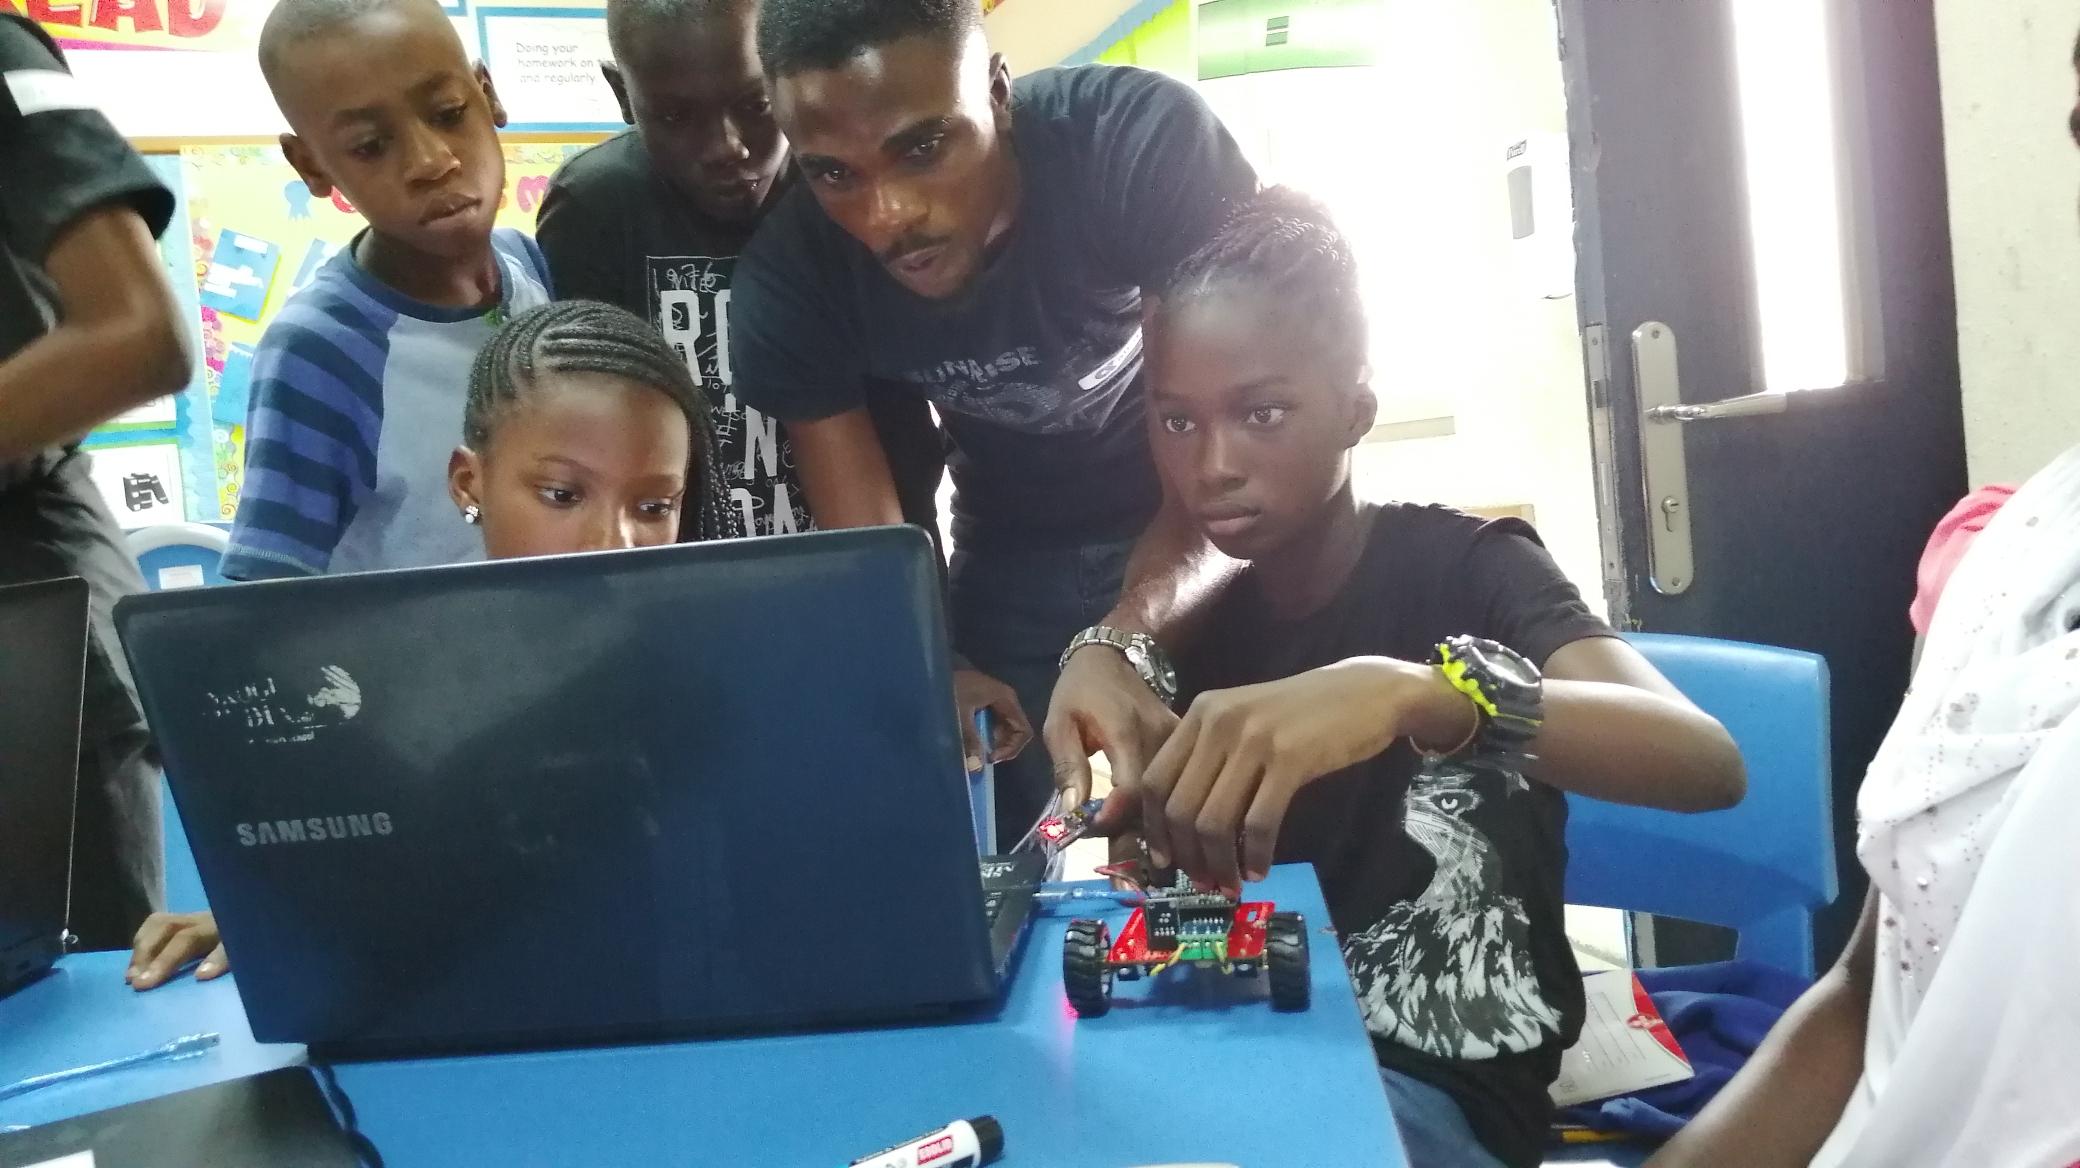 Robotics training at codefunky 2019